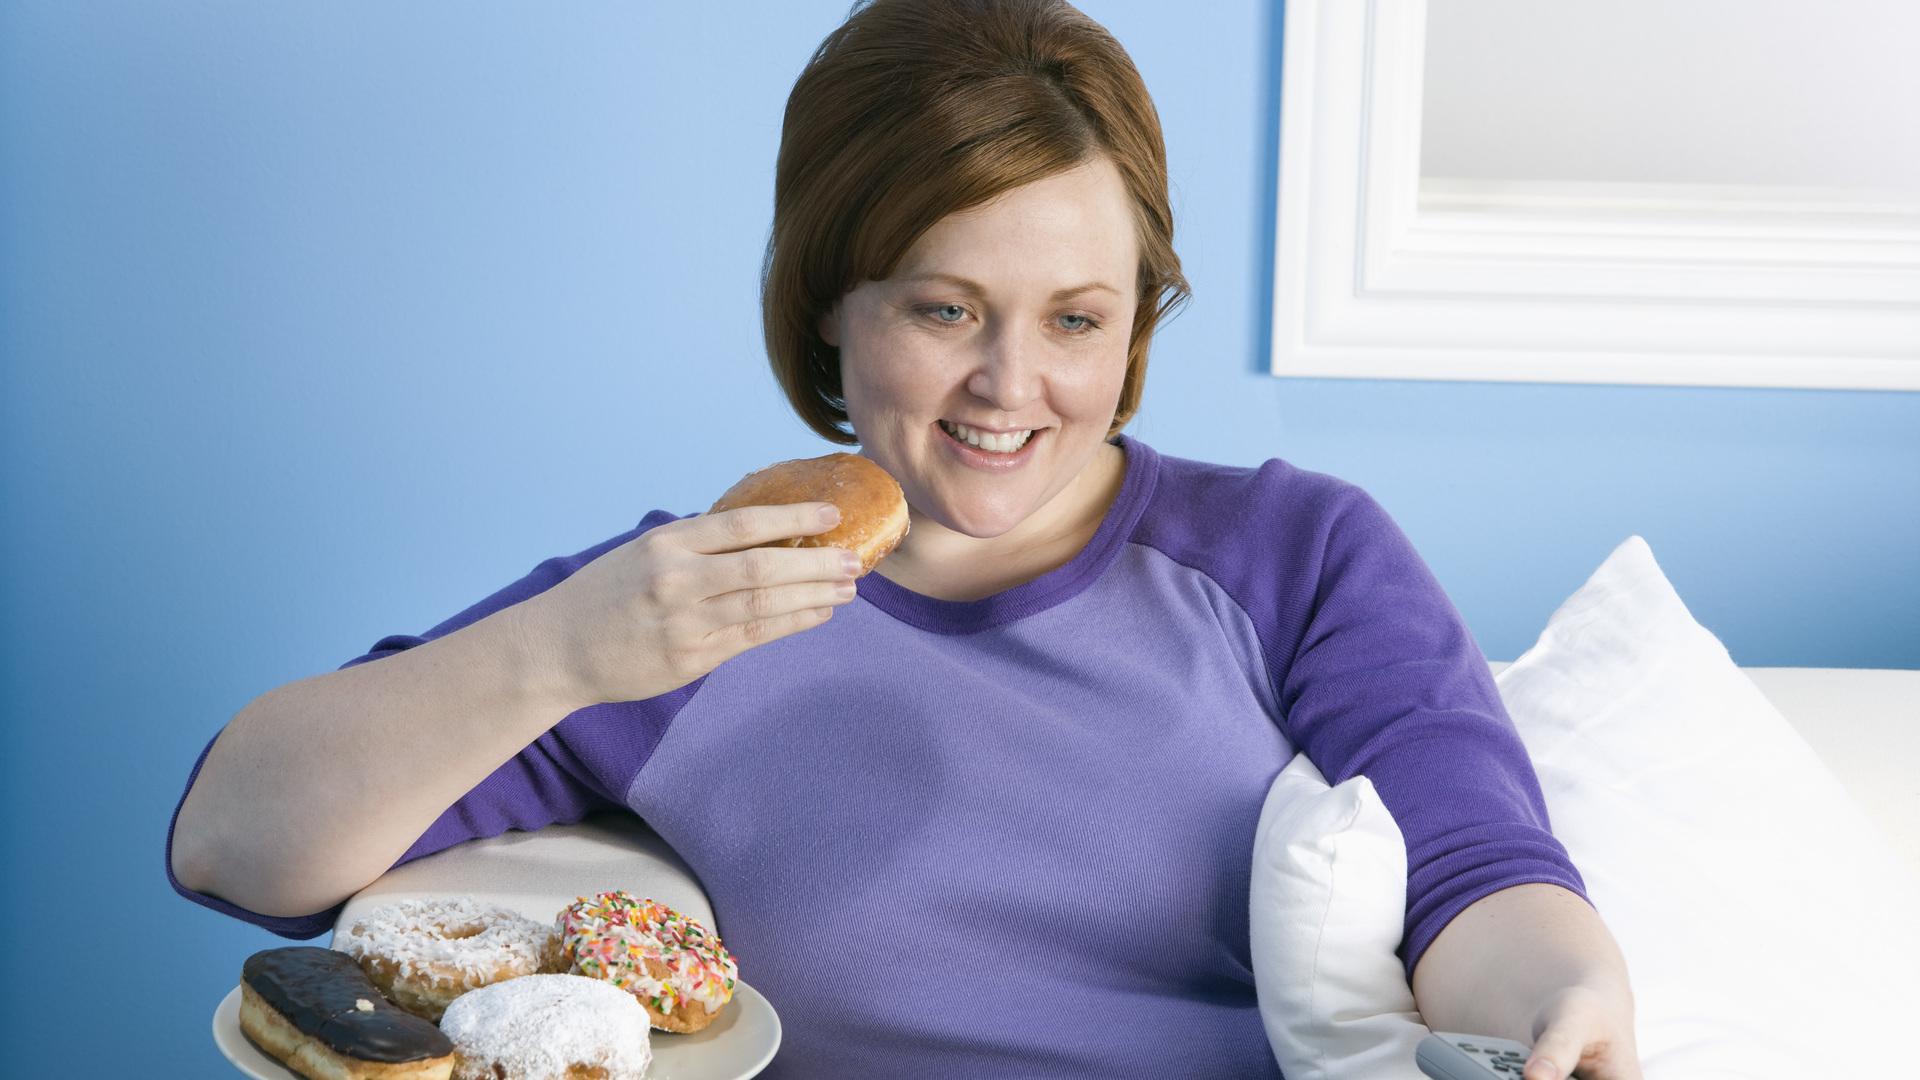 снизить вес диабет группа